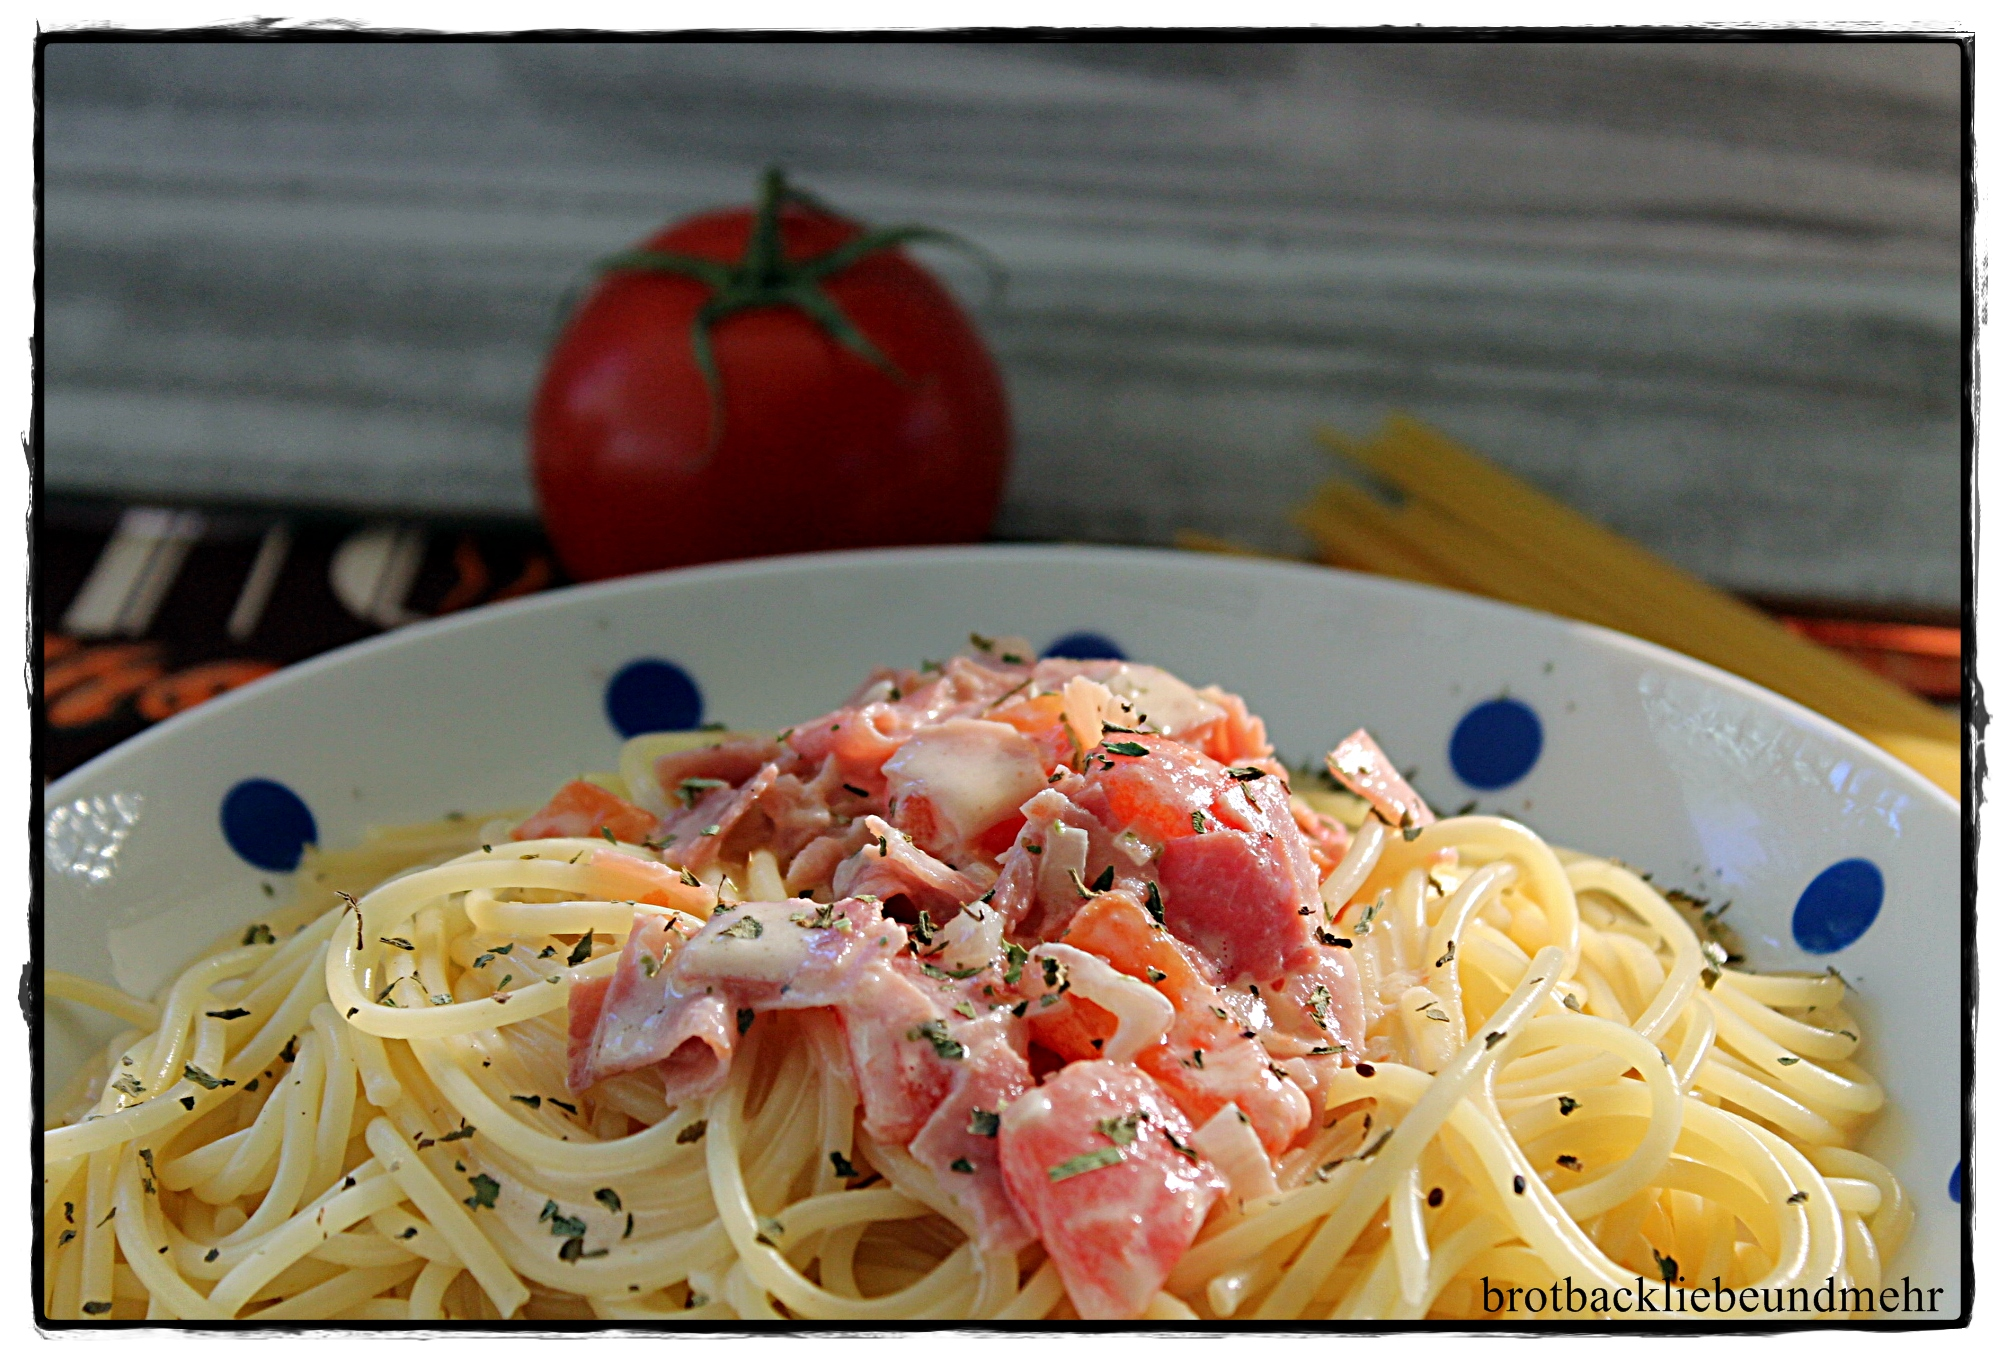 Spaghetti in Käse-Tomaten-Schinken-Soße